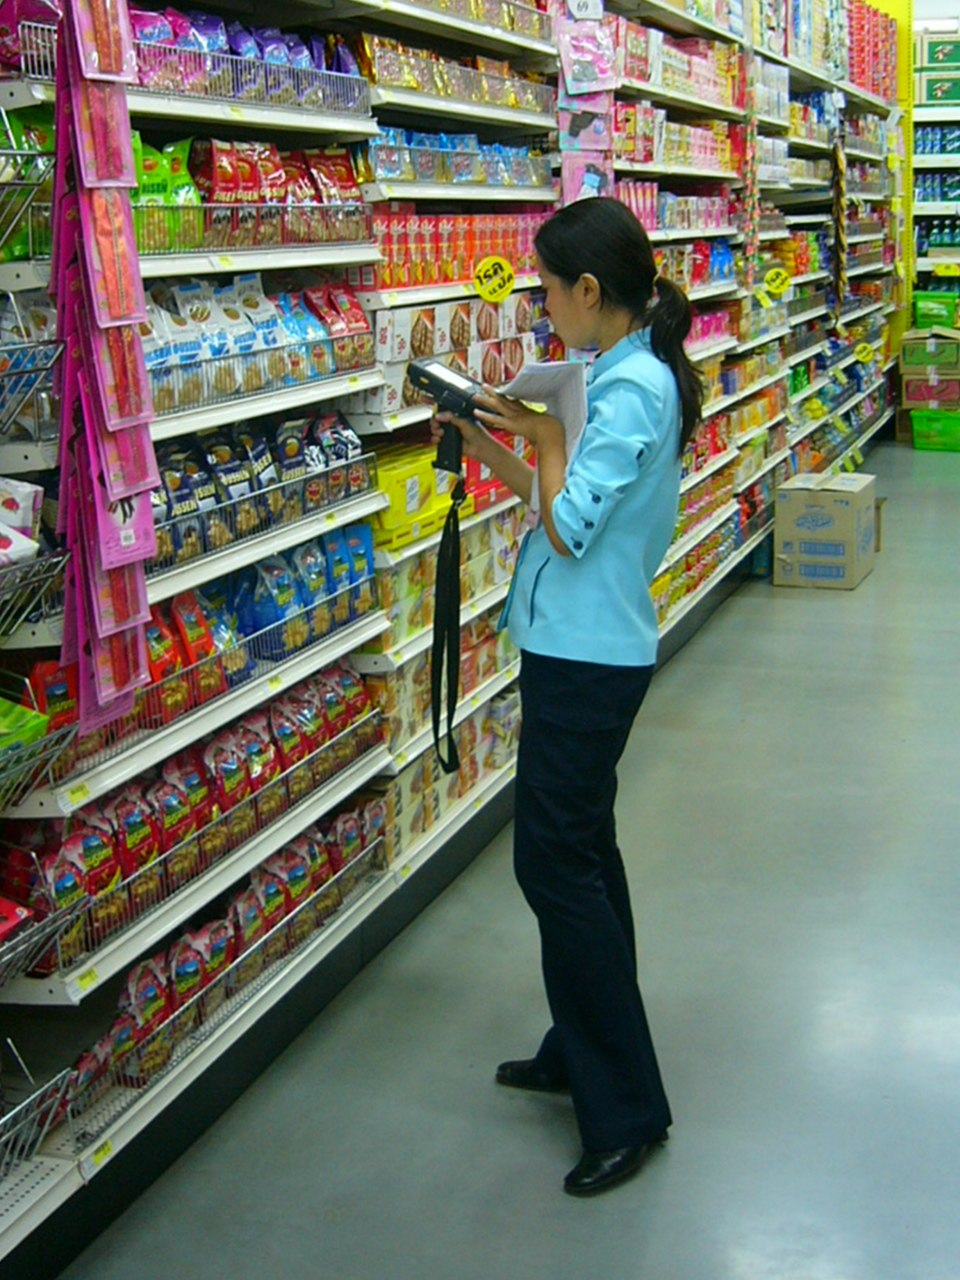 Clerk inventory